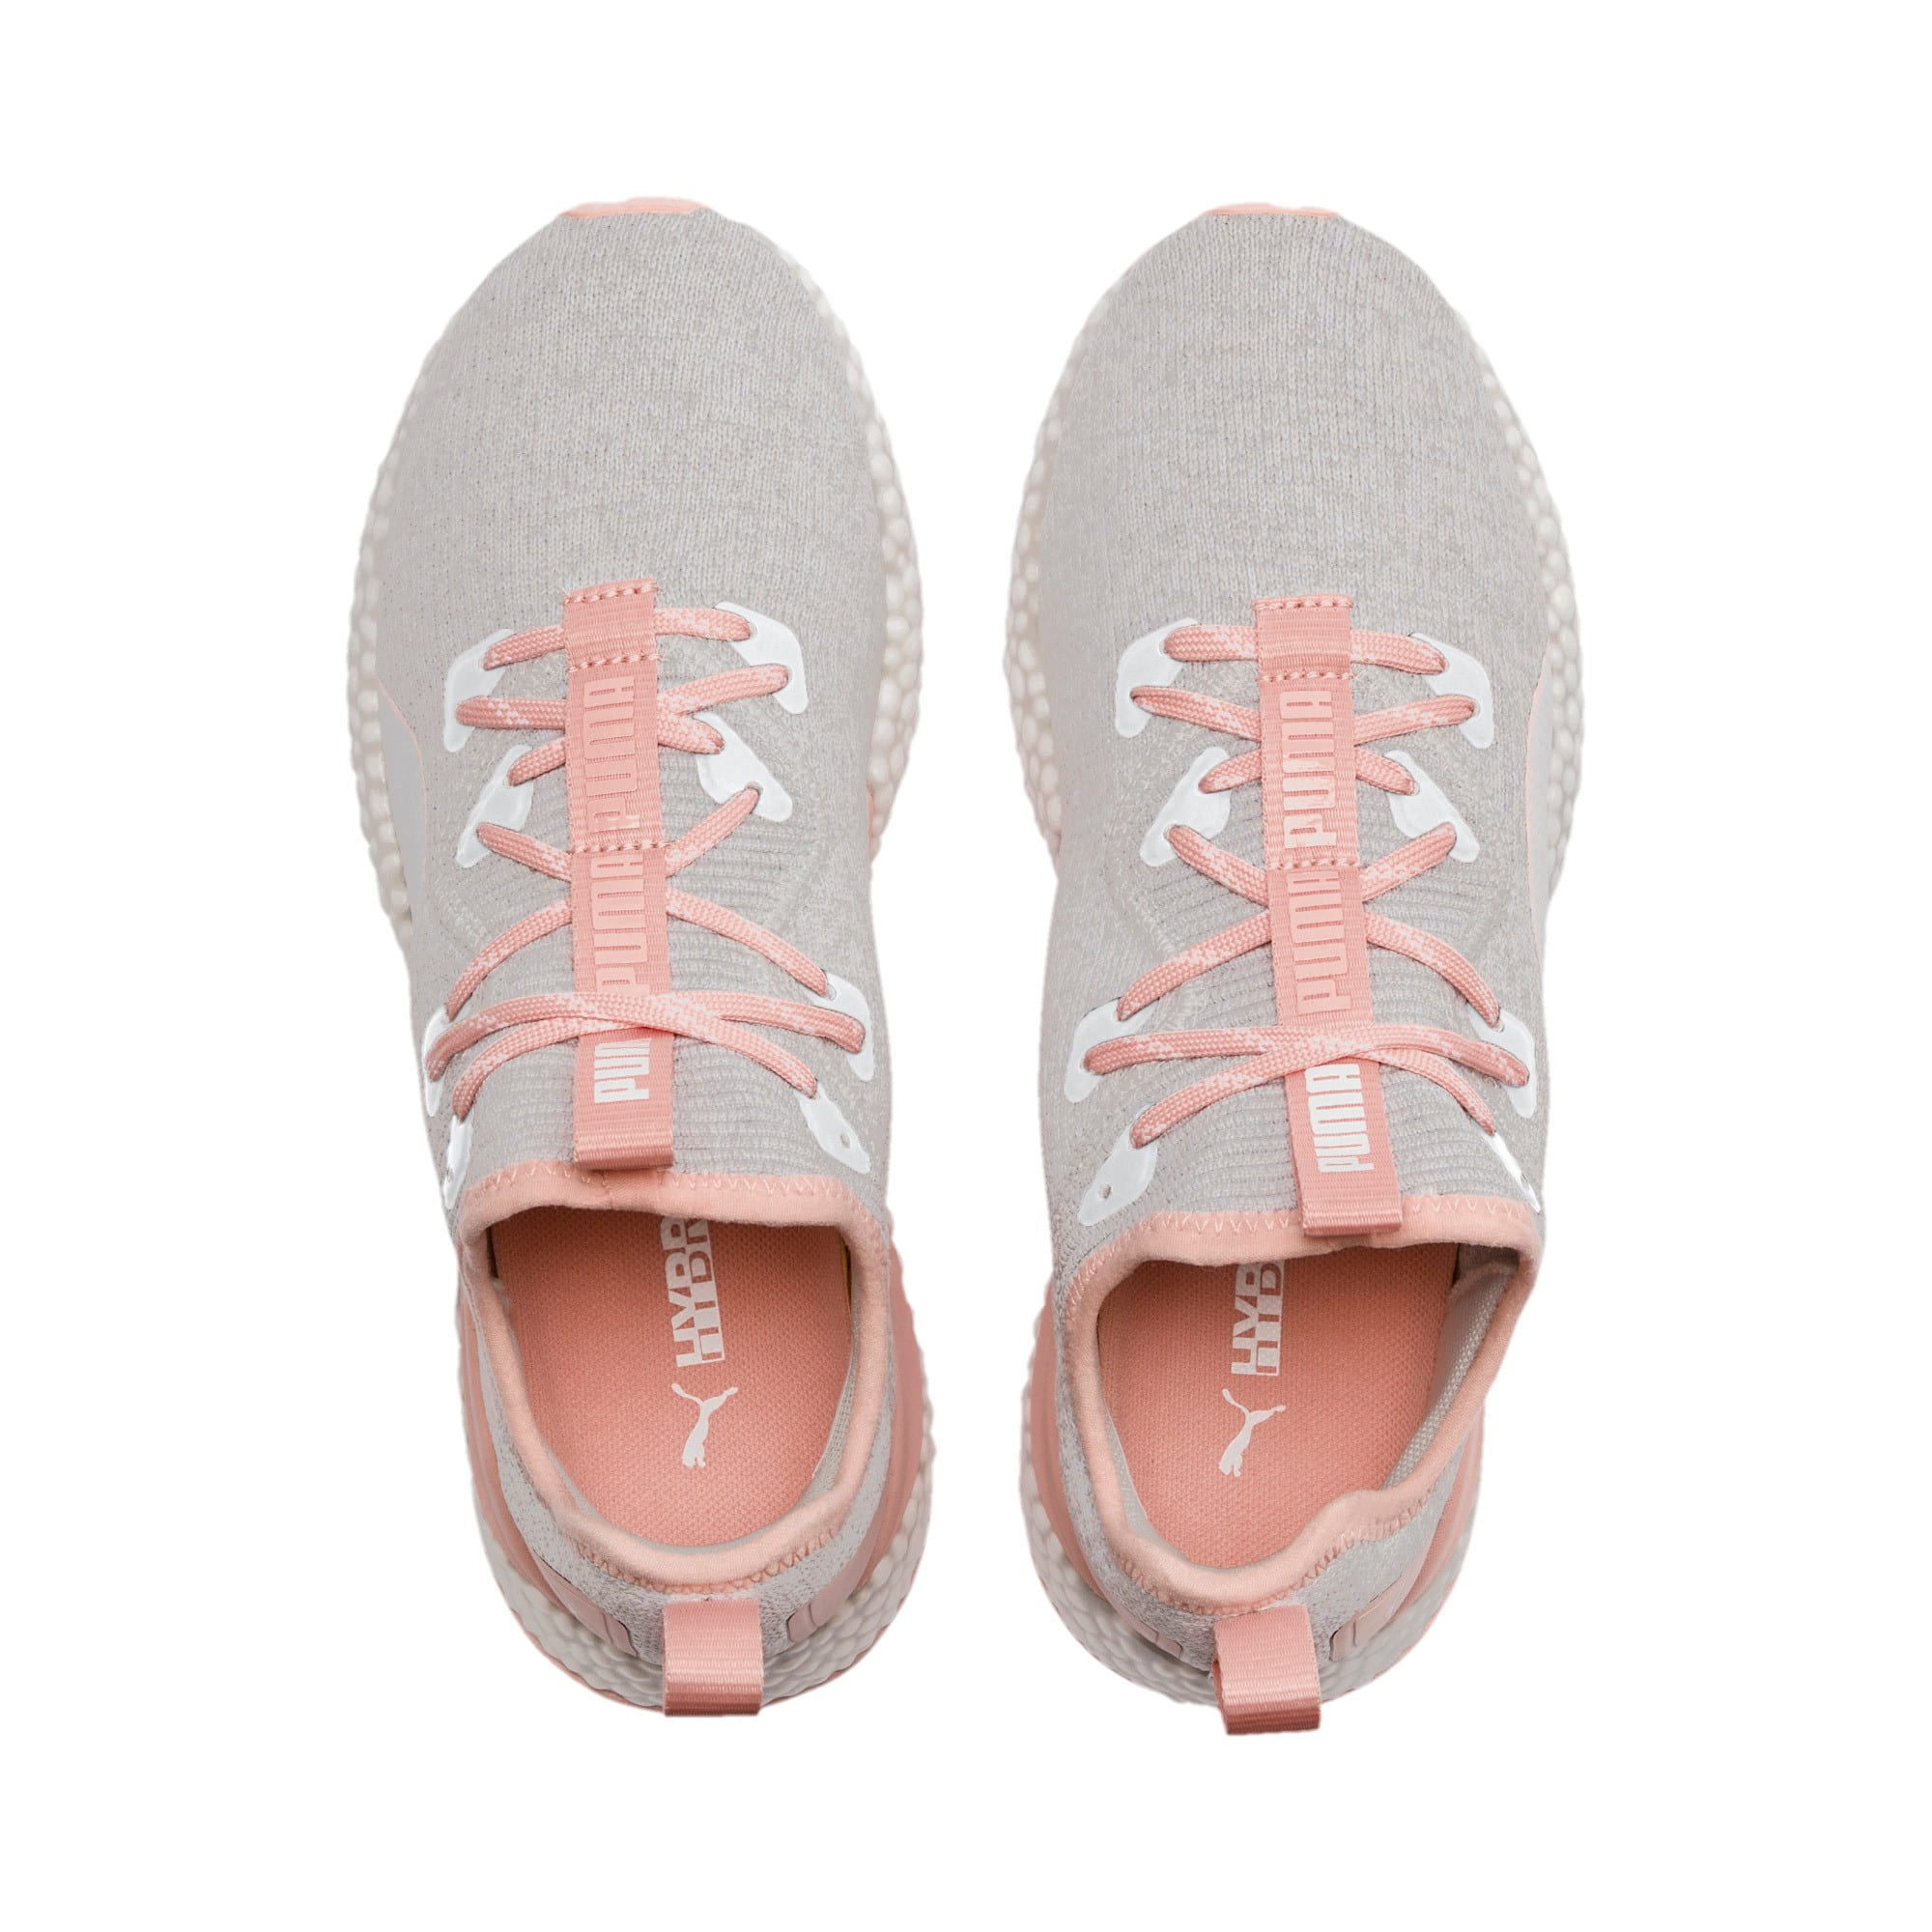 Thumbnail 7 of HYBRID Runner Women's Running Shoes, Glacier Gray-Peach Bud, medium